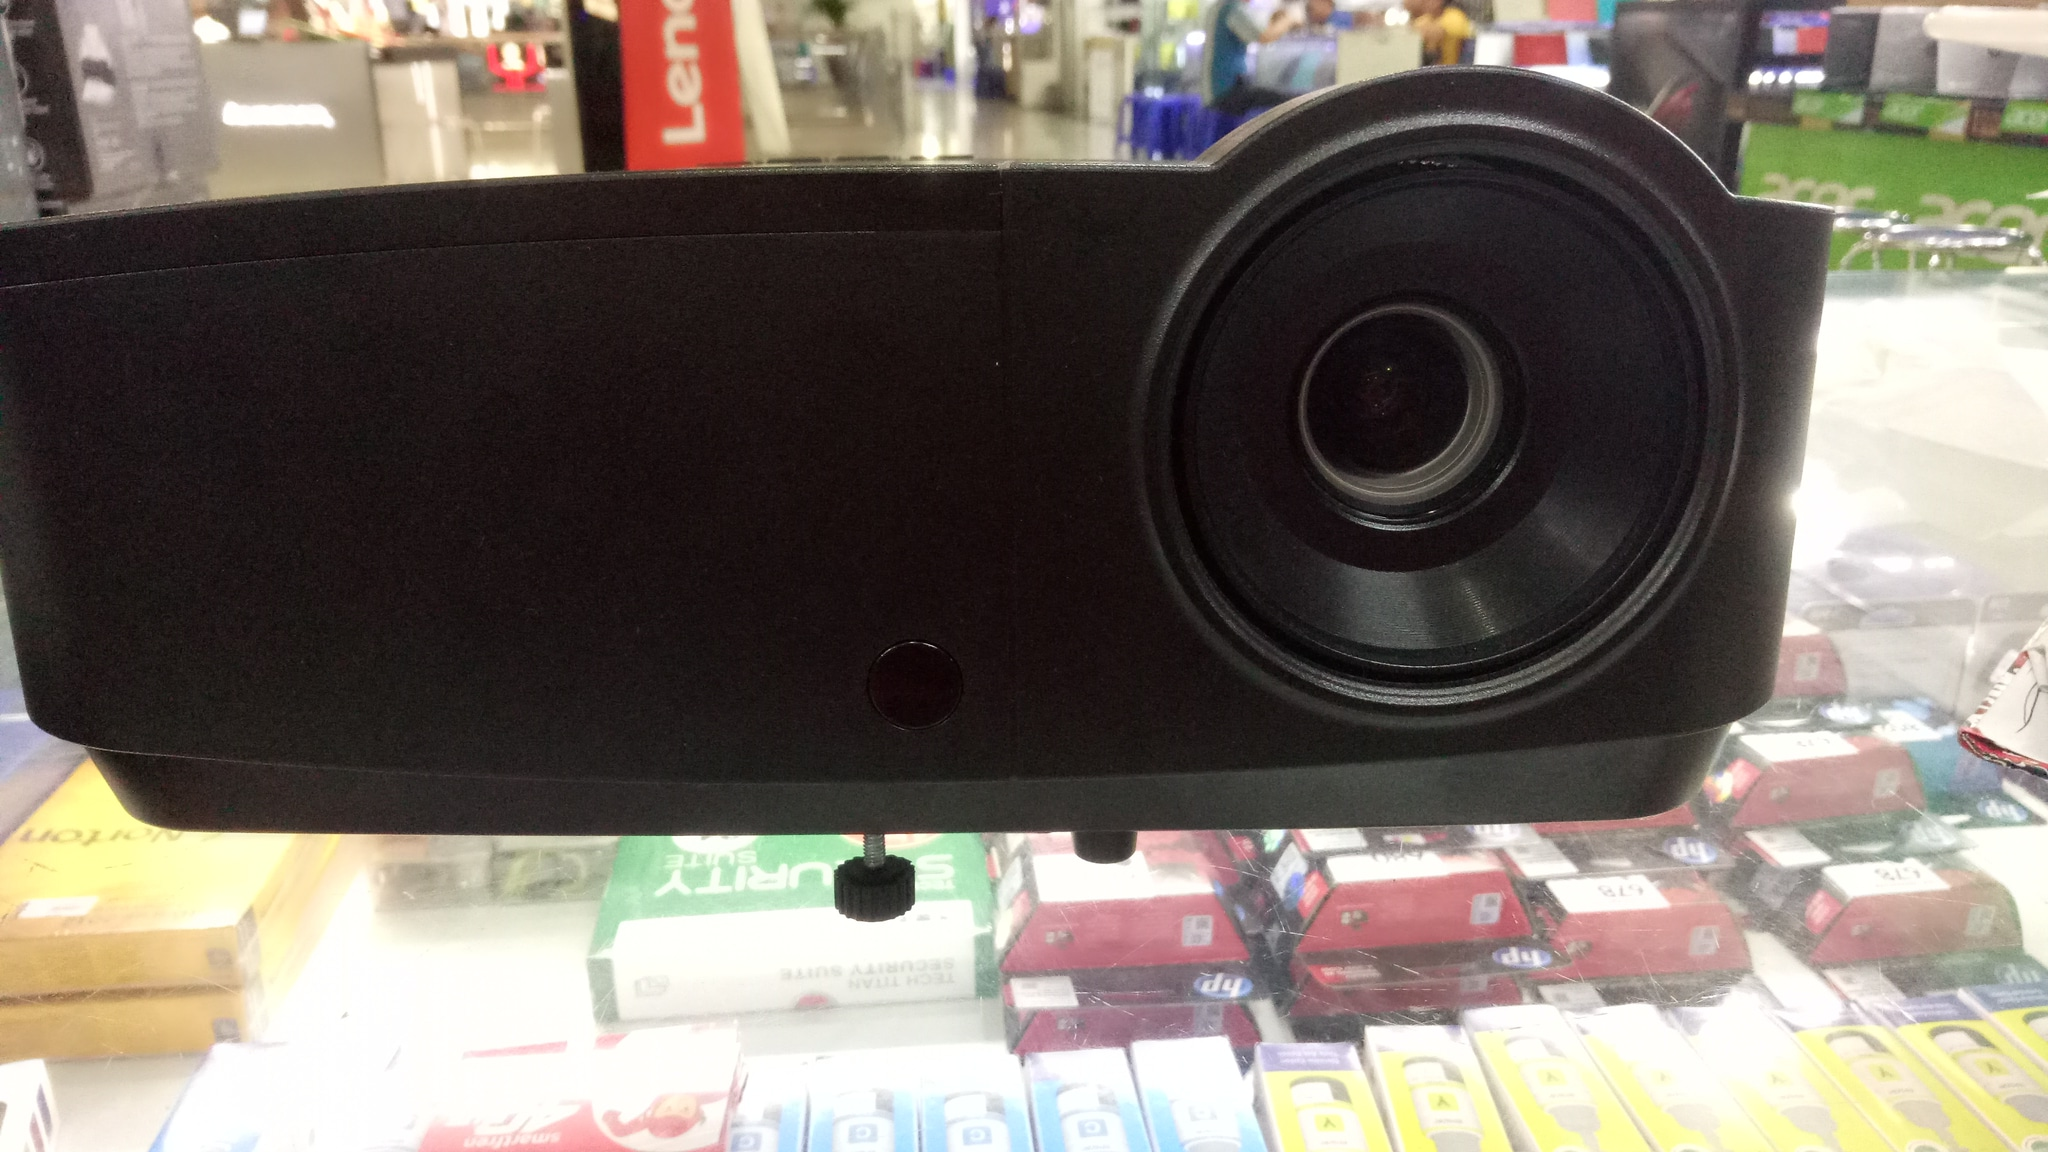 Jual Projector Infocus In226 Jogja Proshop Tokopedia Cus